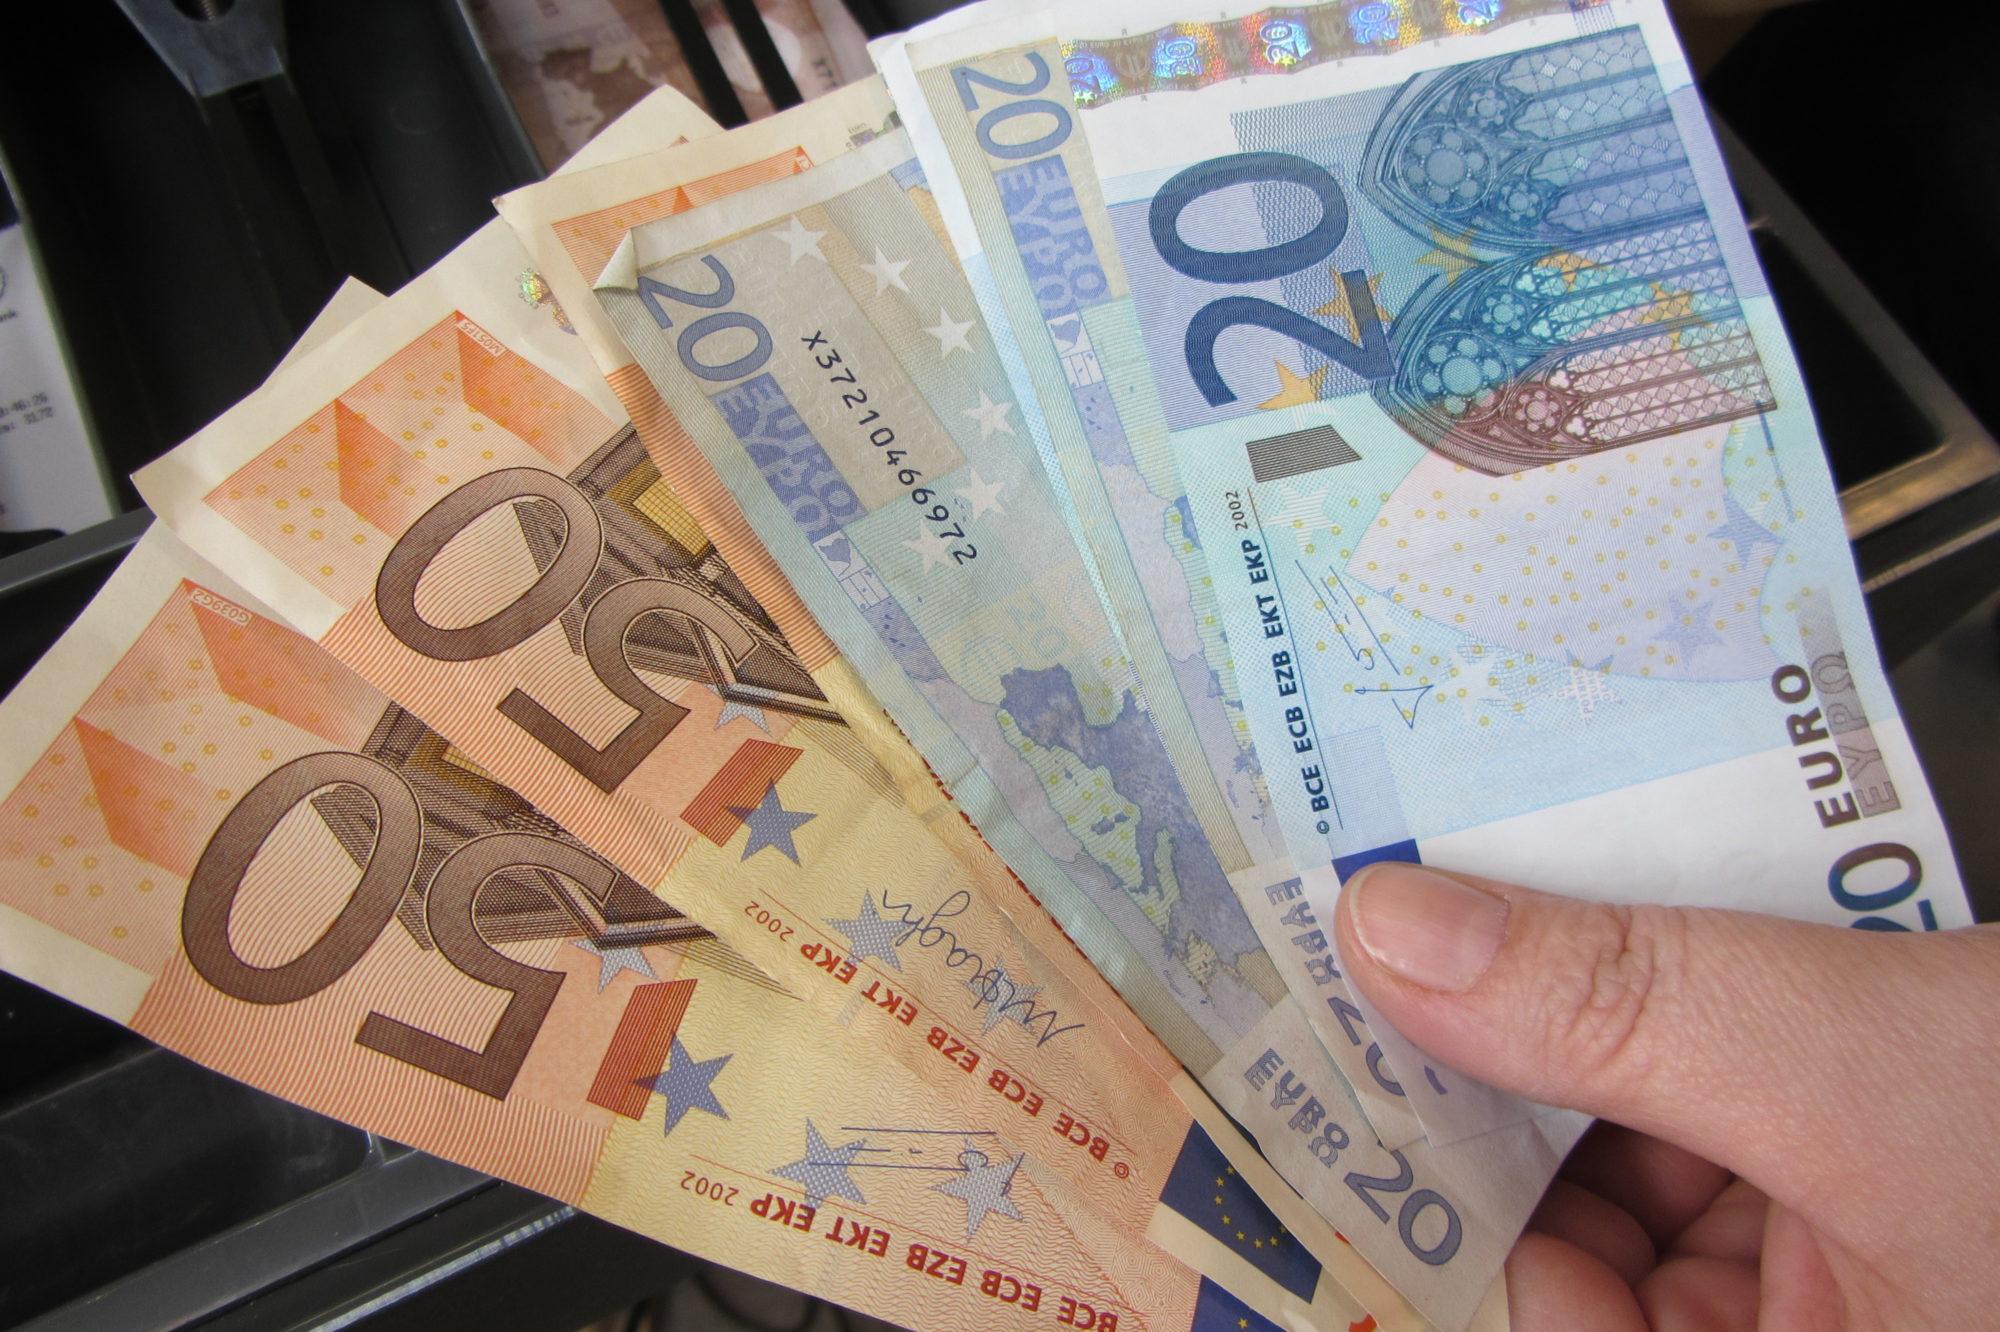 ВВП Латвии во втором квартале рухнул на 9,8%